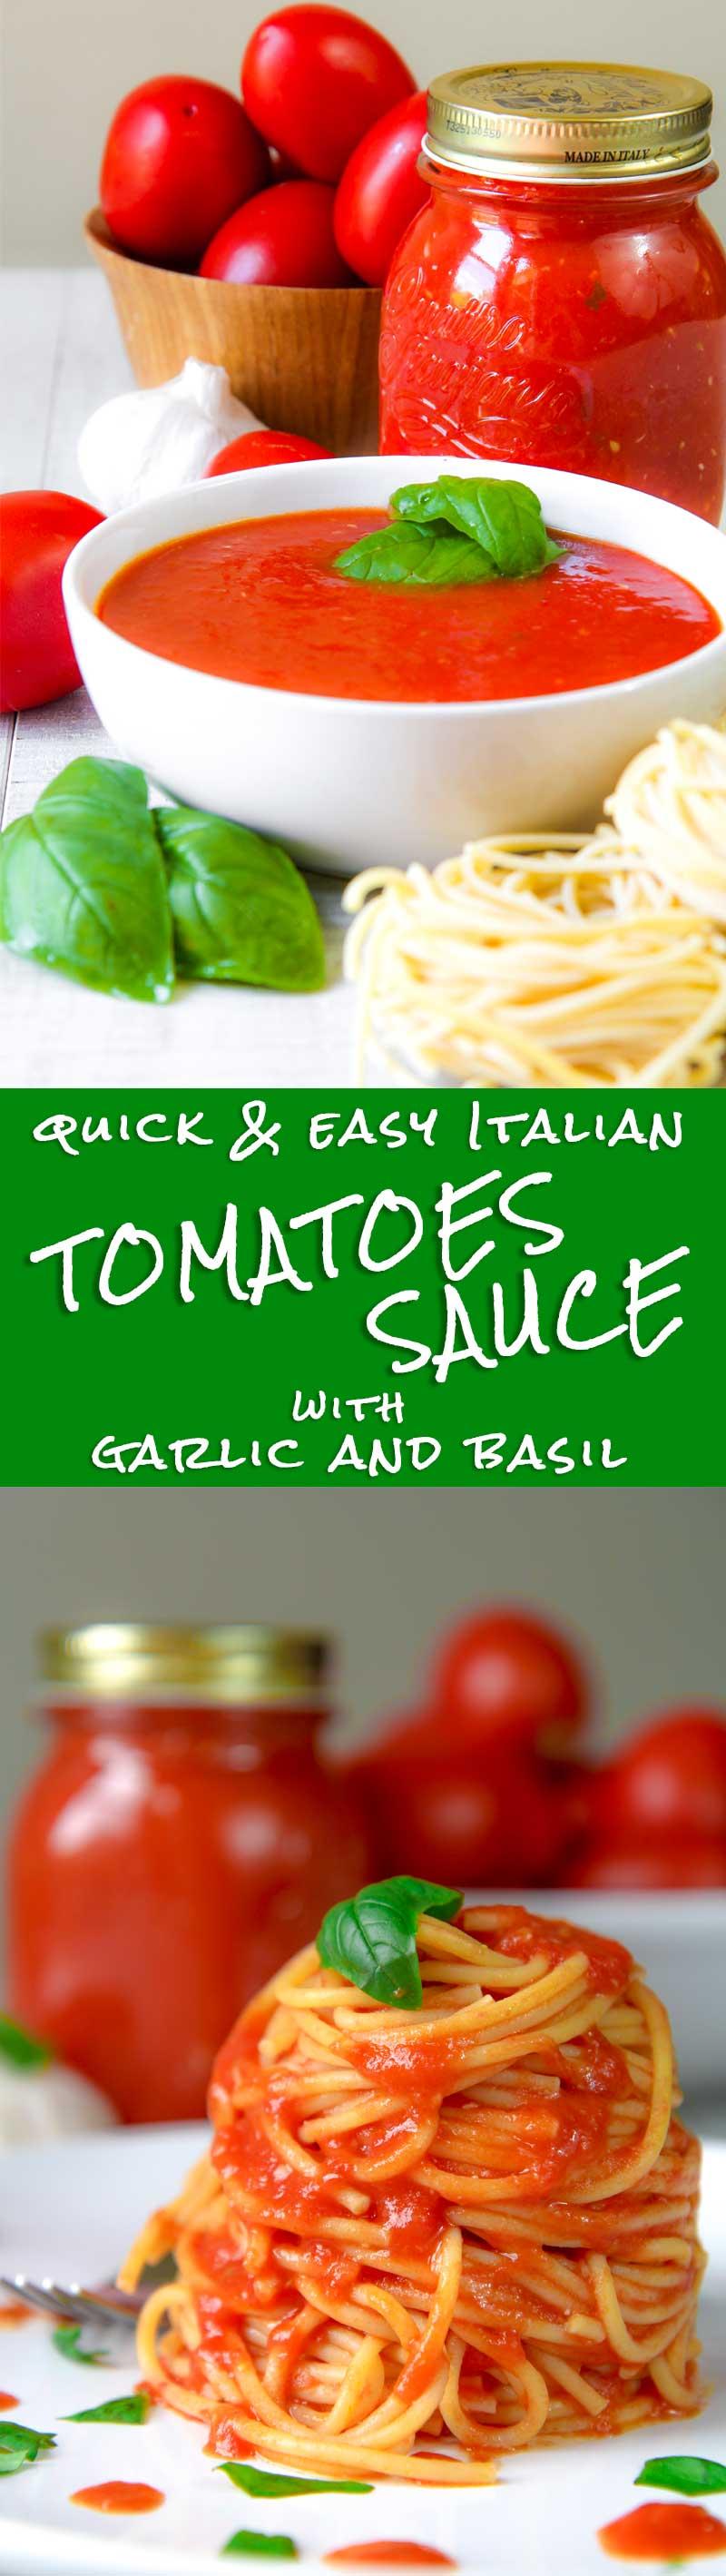 EASY TOMATOES SAUCE ITALIAN WAY with garlic and fresh basil